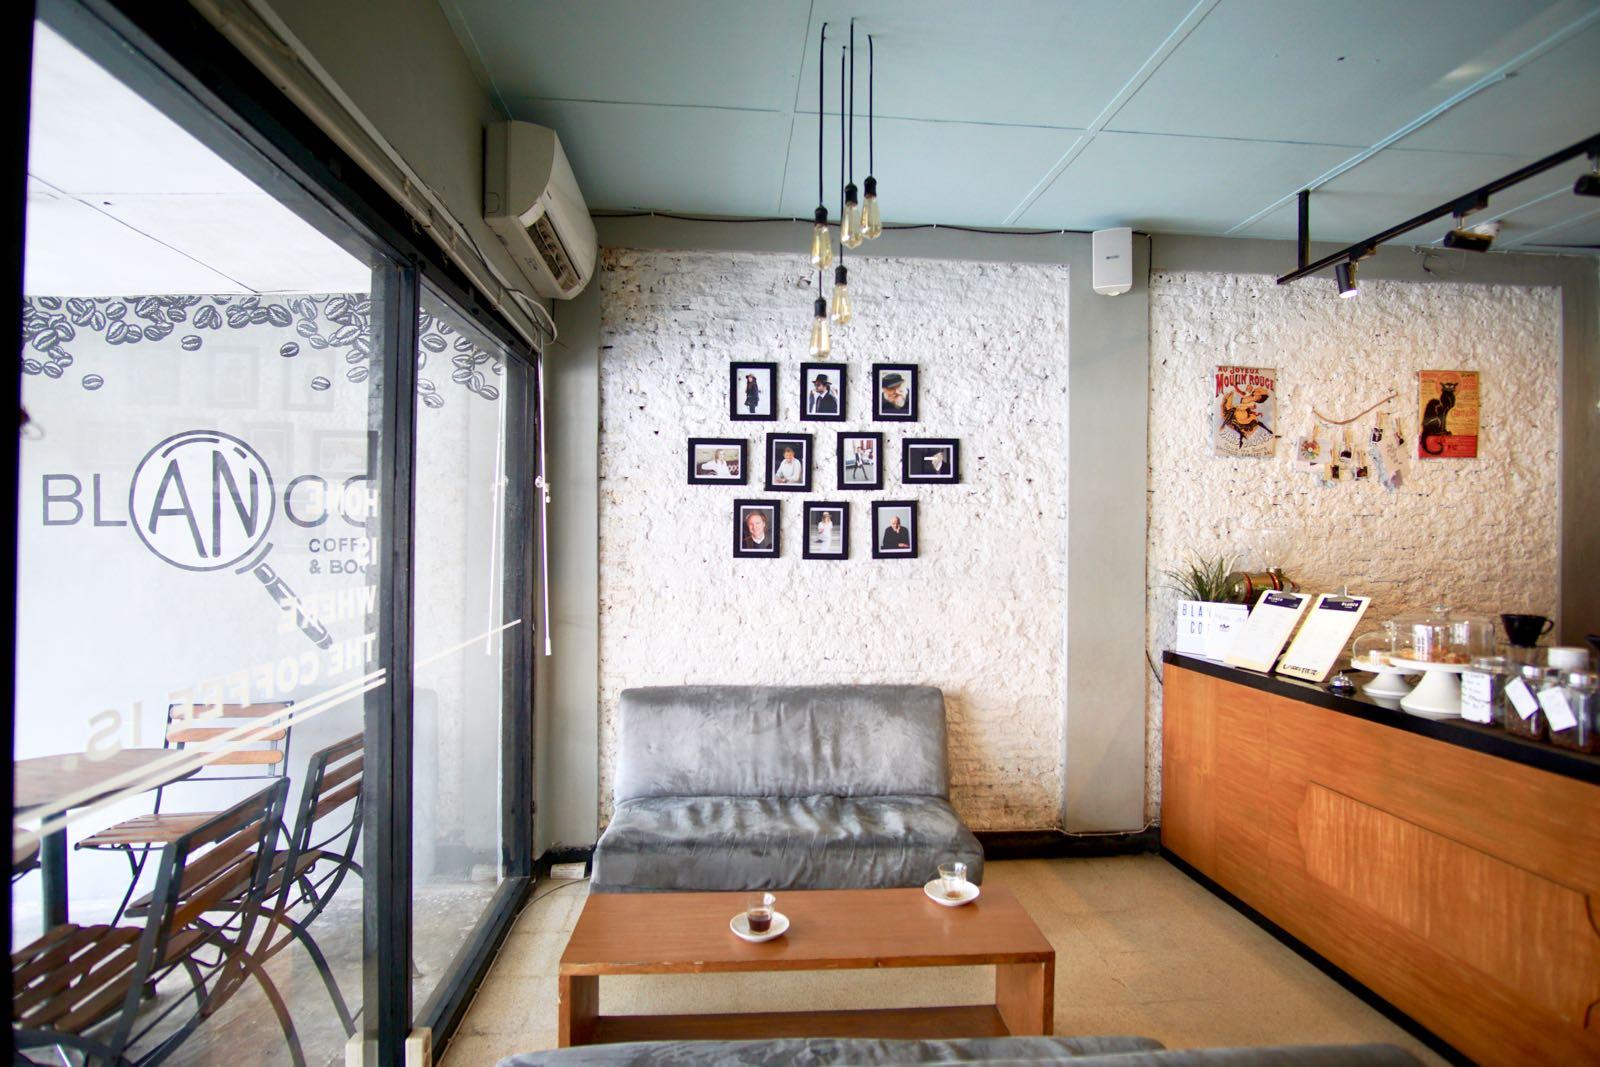 wisata kuliner Yogyakarta kekinian - Blanco Coffee and Books (pergidulu)